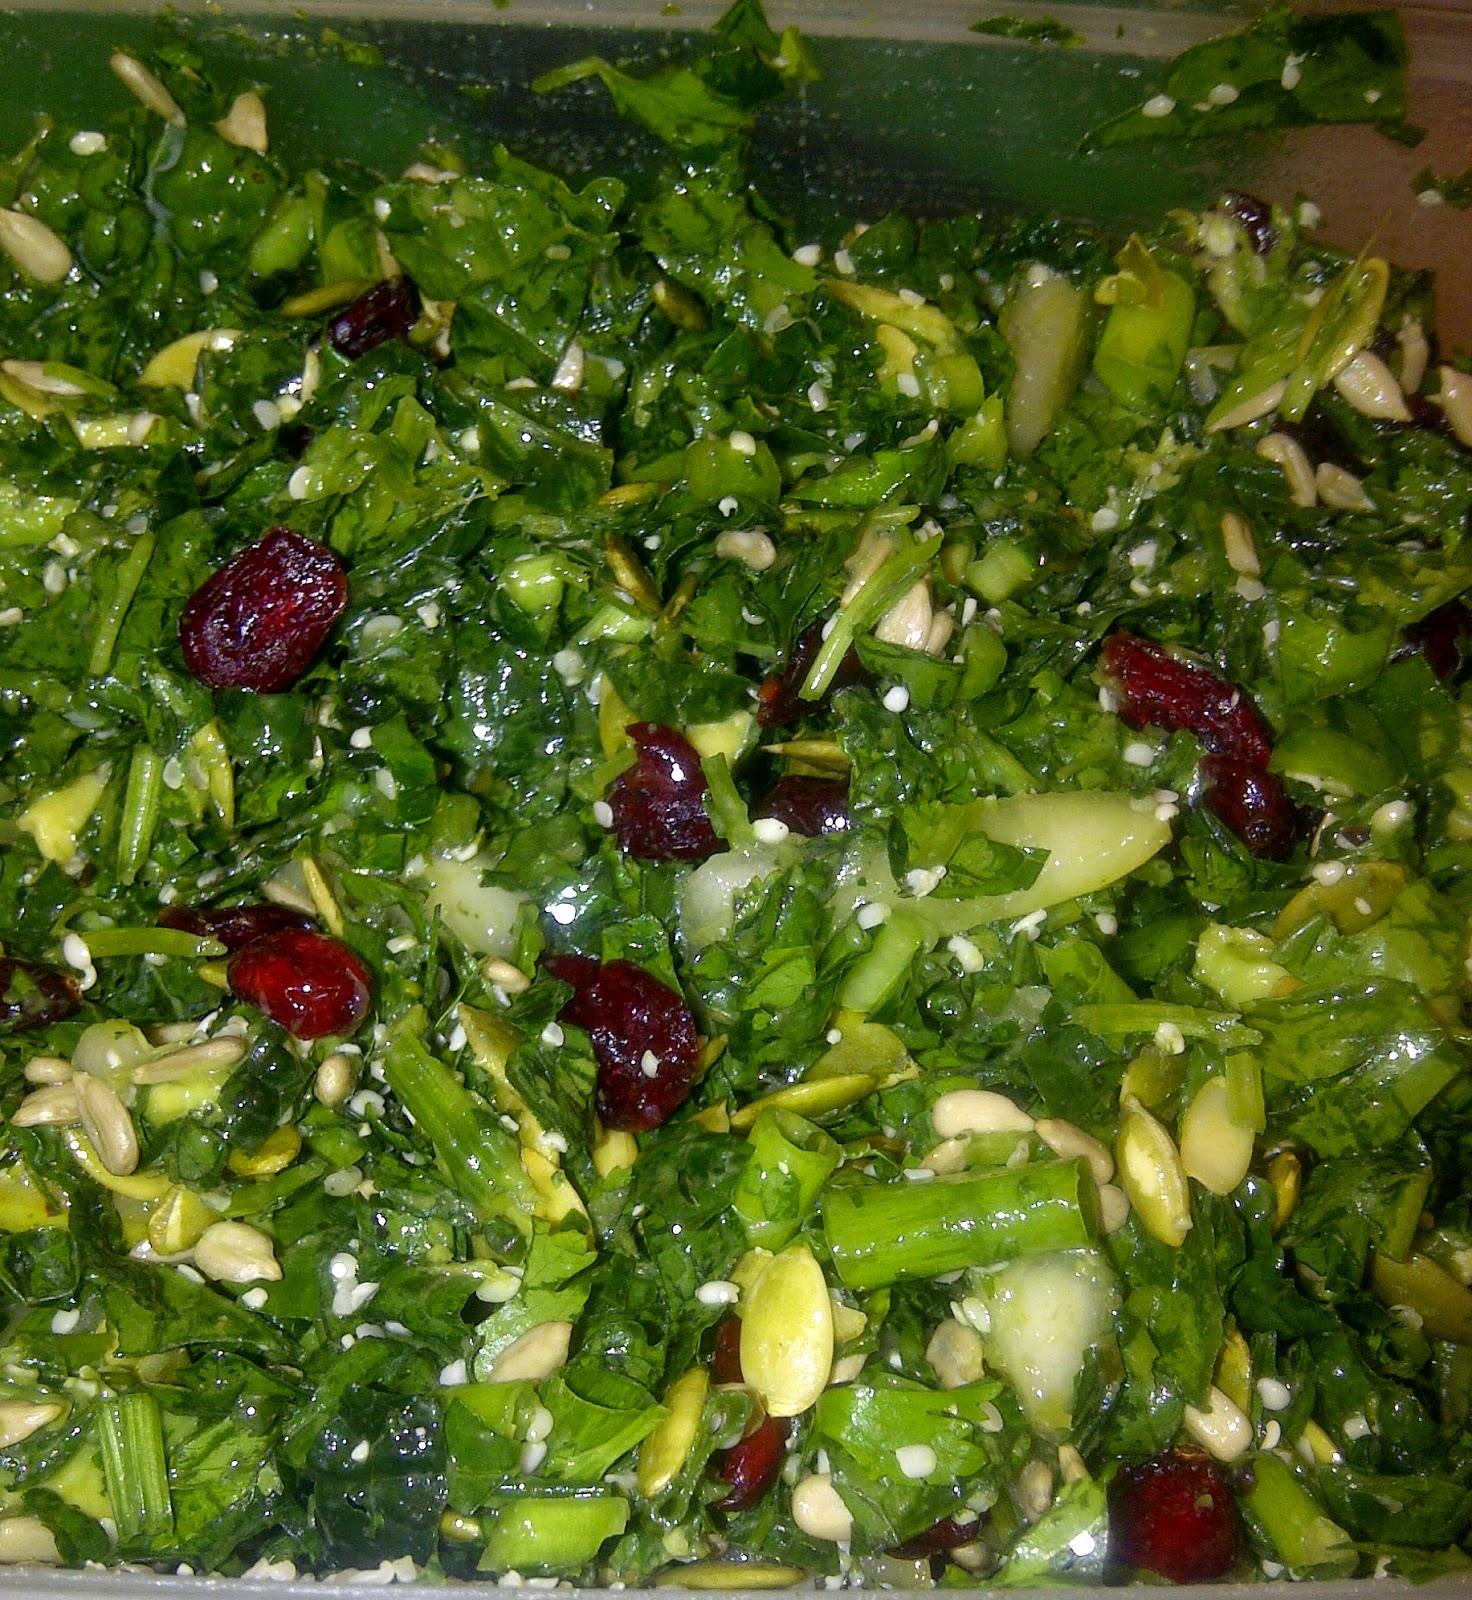 Kale and diarrhea